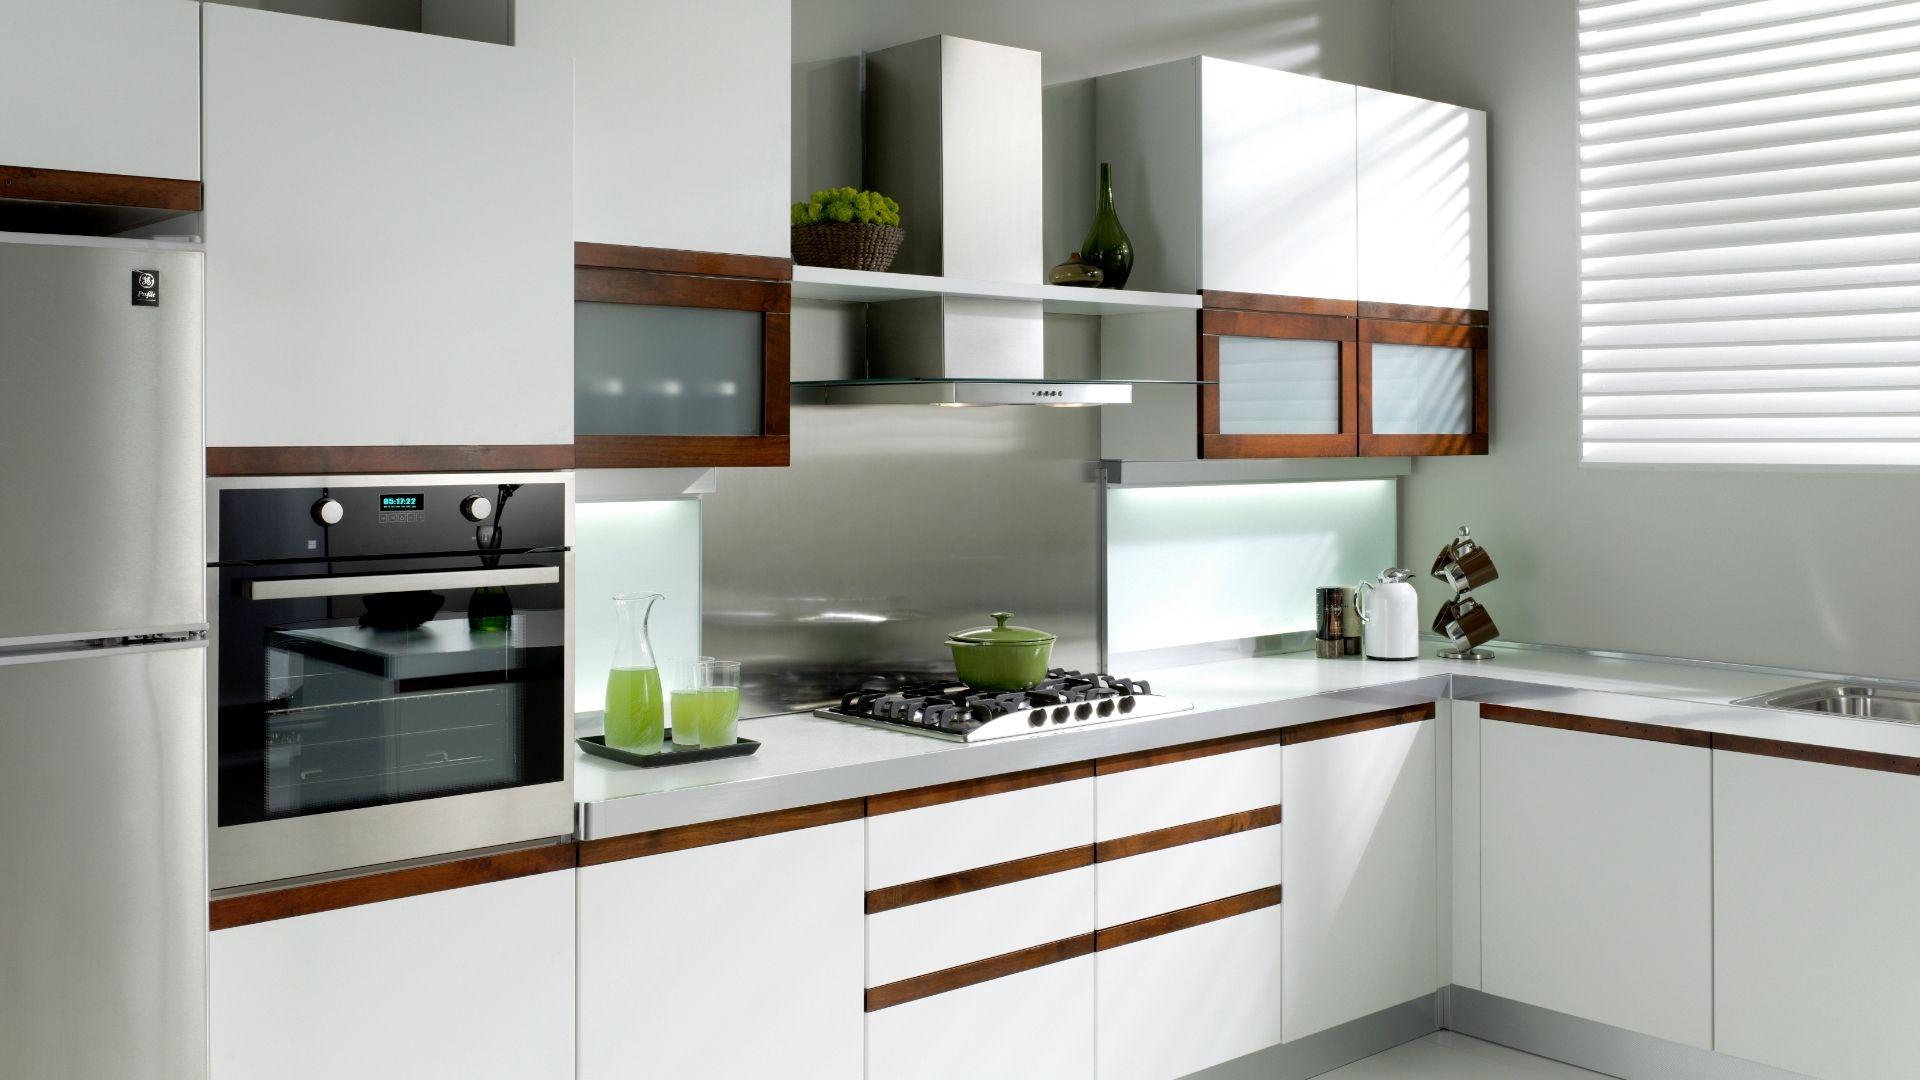 Tips For A Cheap Kitchen Improvement Project by Sofiya Machulskaya